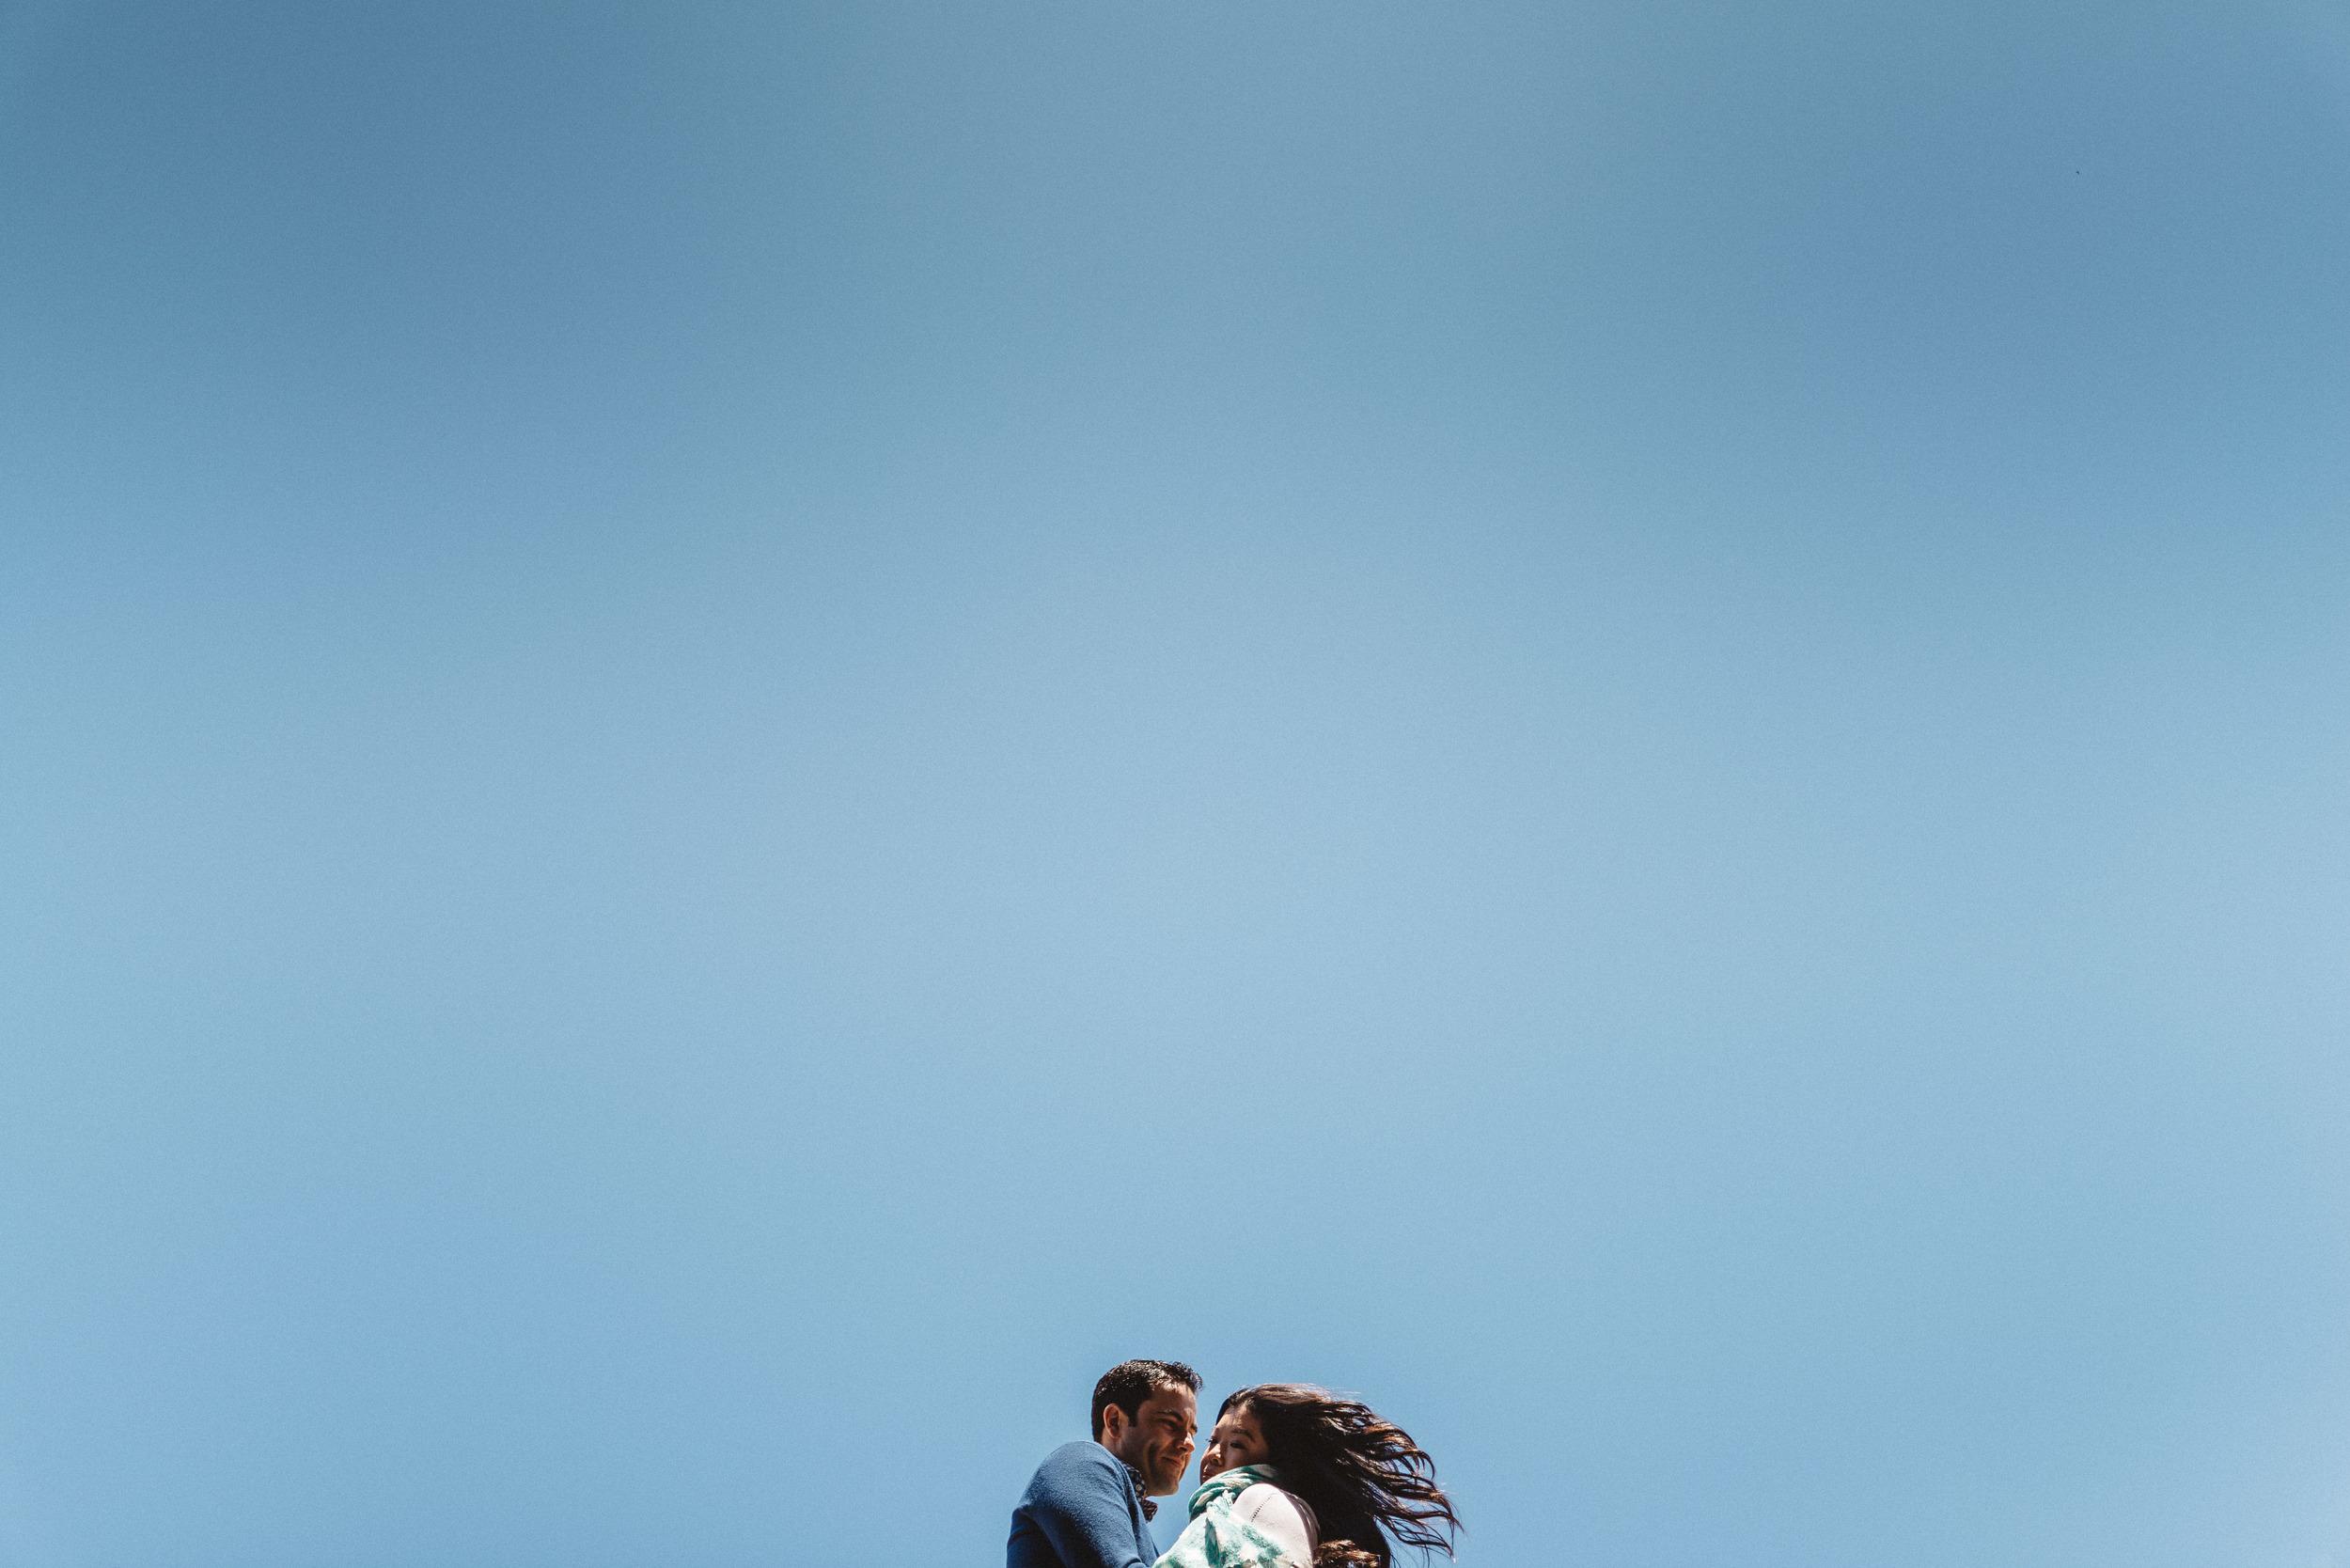 Happy engaged couple posing for artistic, minimalist, epic portrait